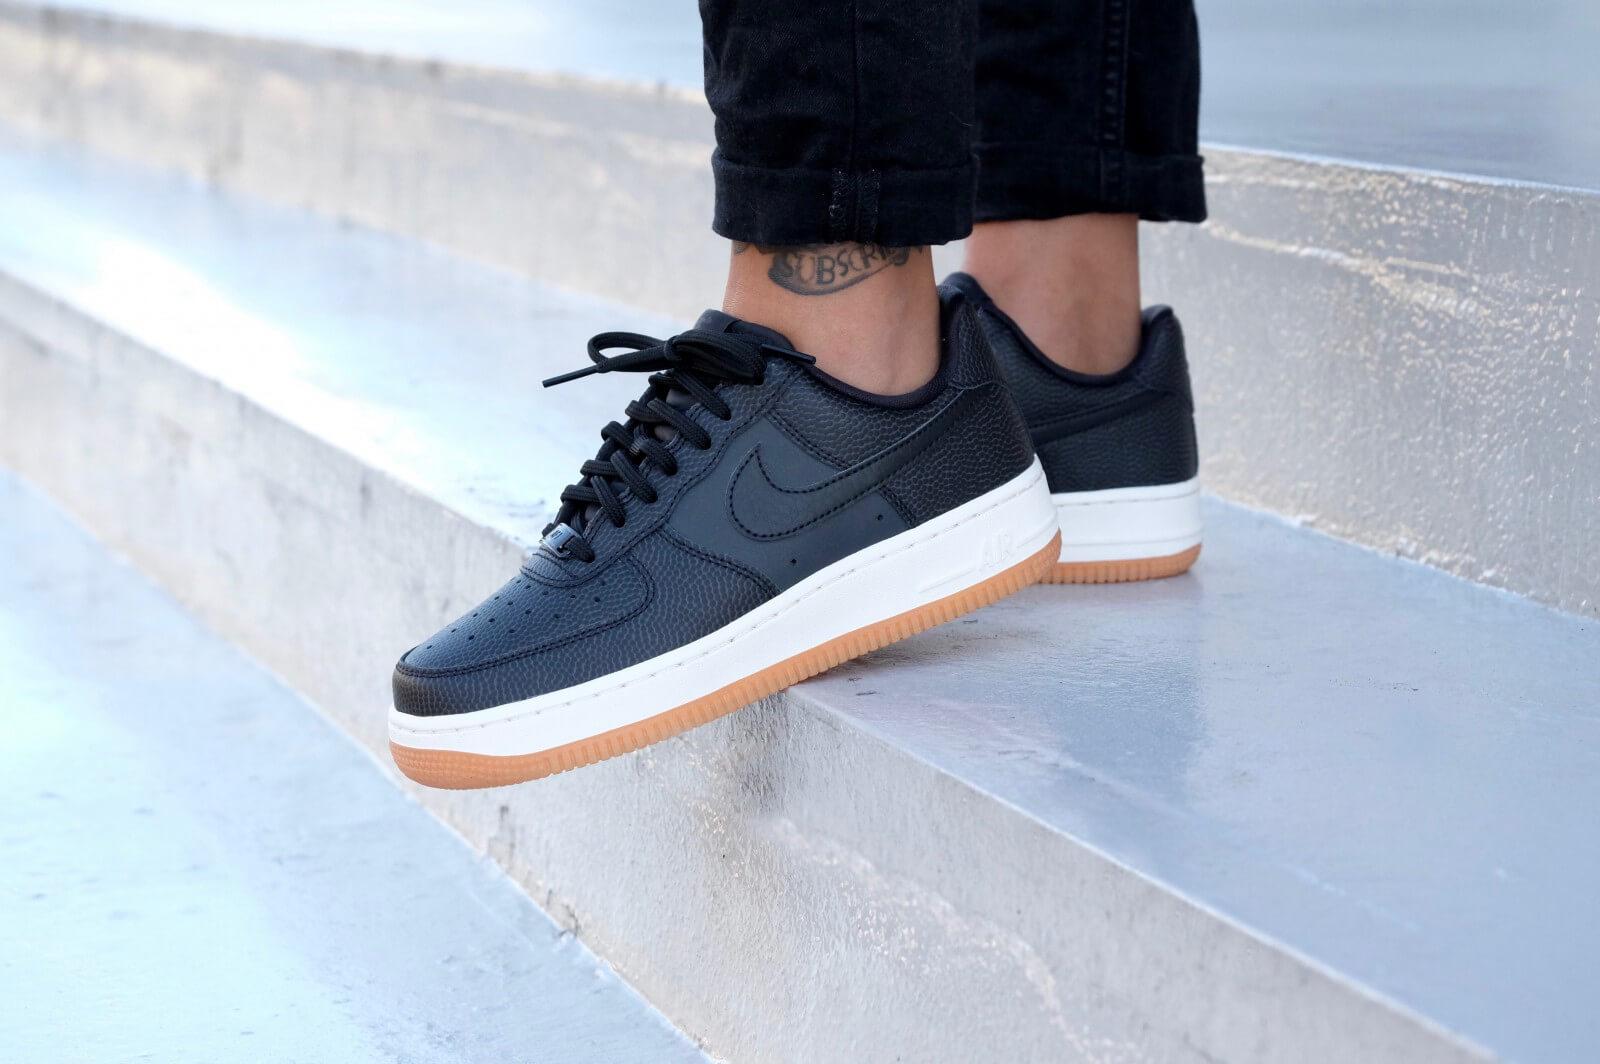 Nike Wmns Air Force 1 07 Seasonal Black Black Sail